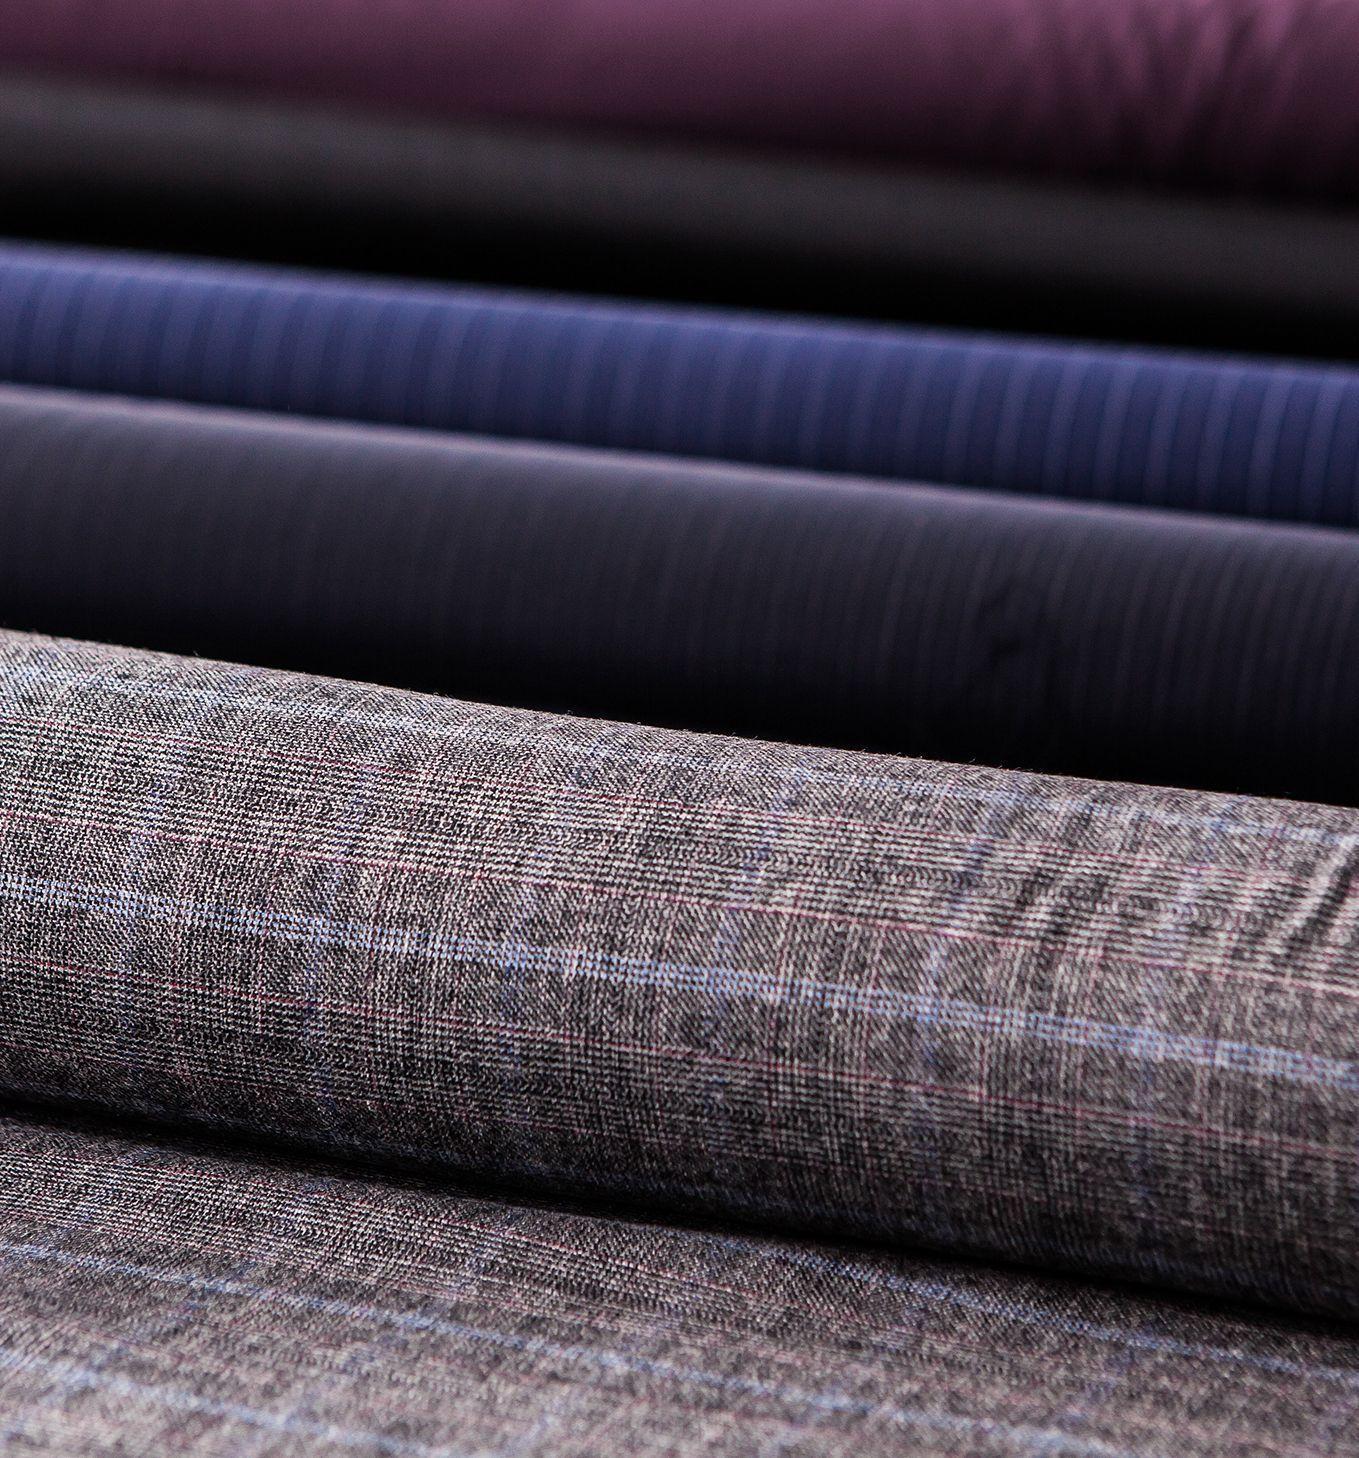 Senszio Tailors Fabrics Image 1